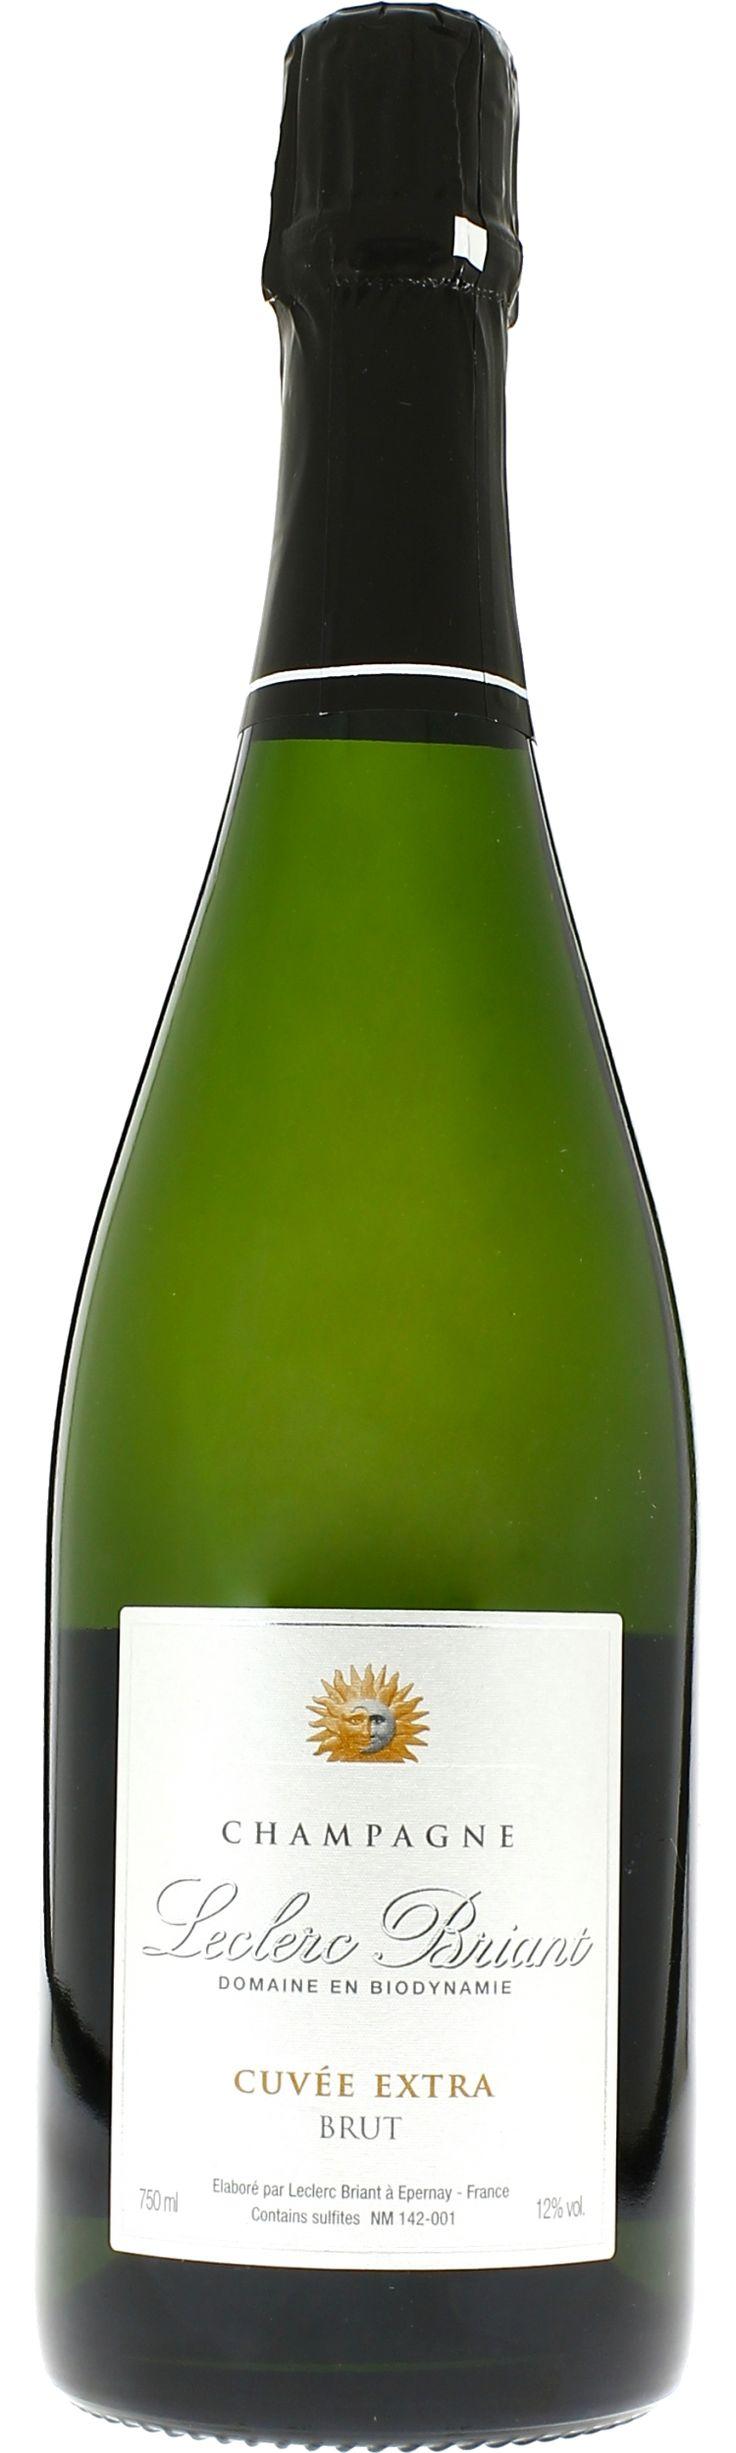 LECLERC BRIANT CUVEE BRUT BIO - achat/vente de Champagne